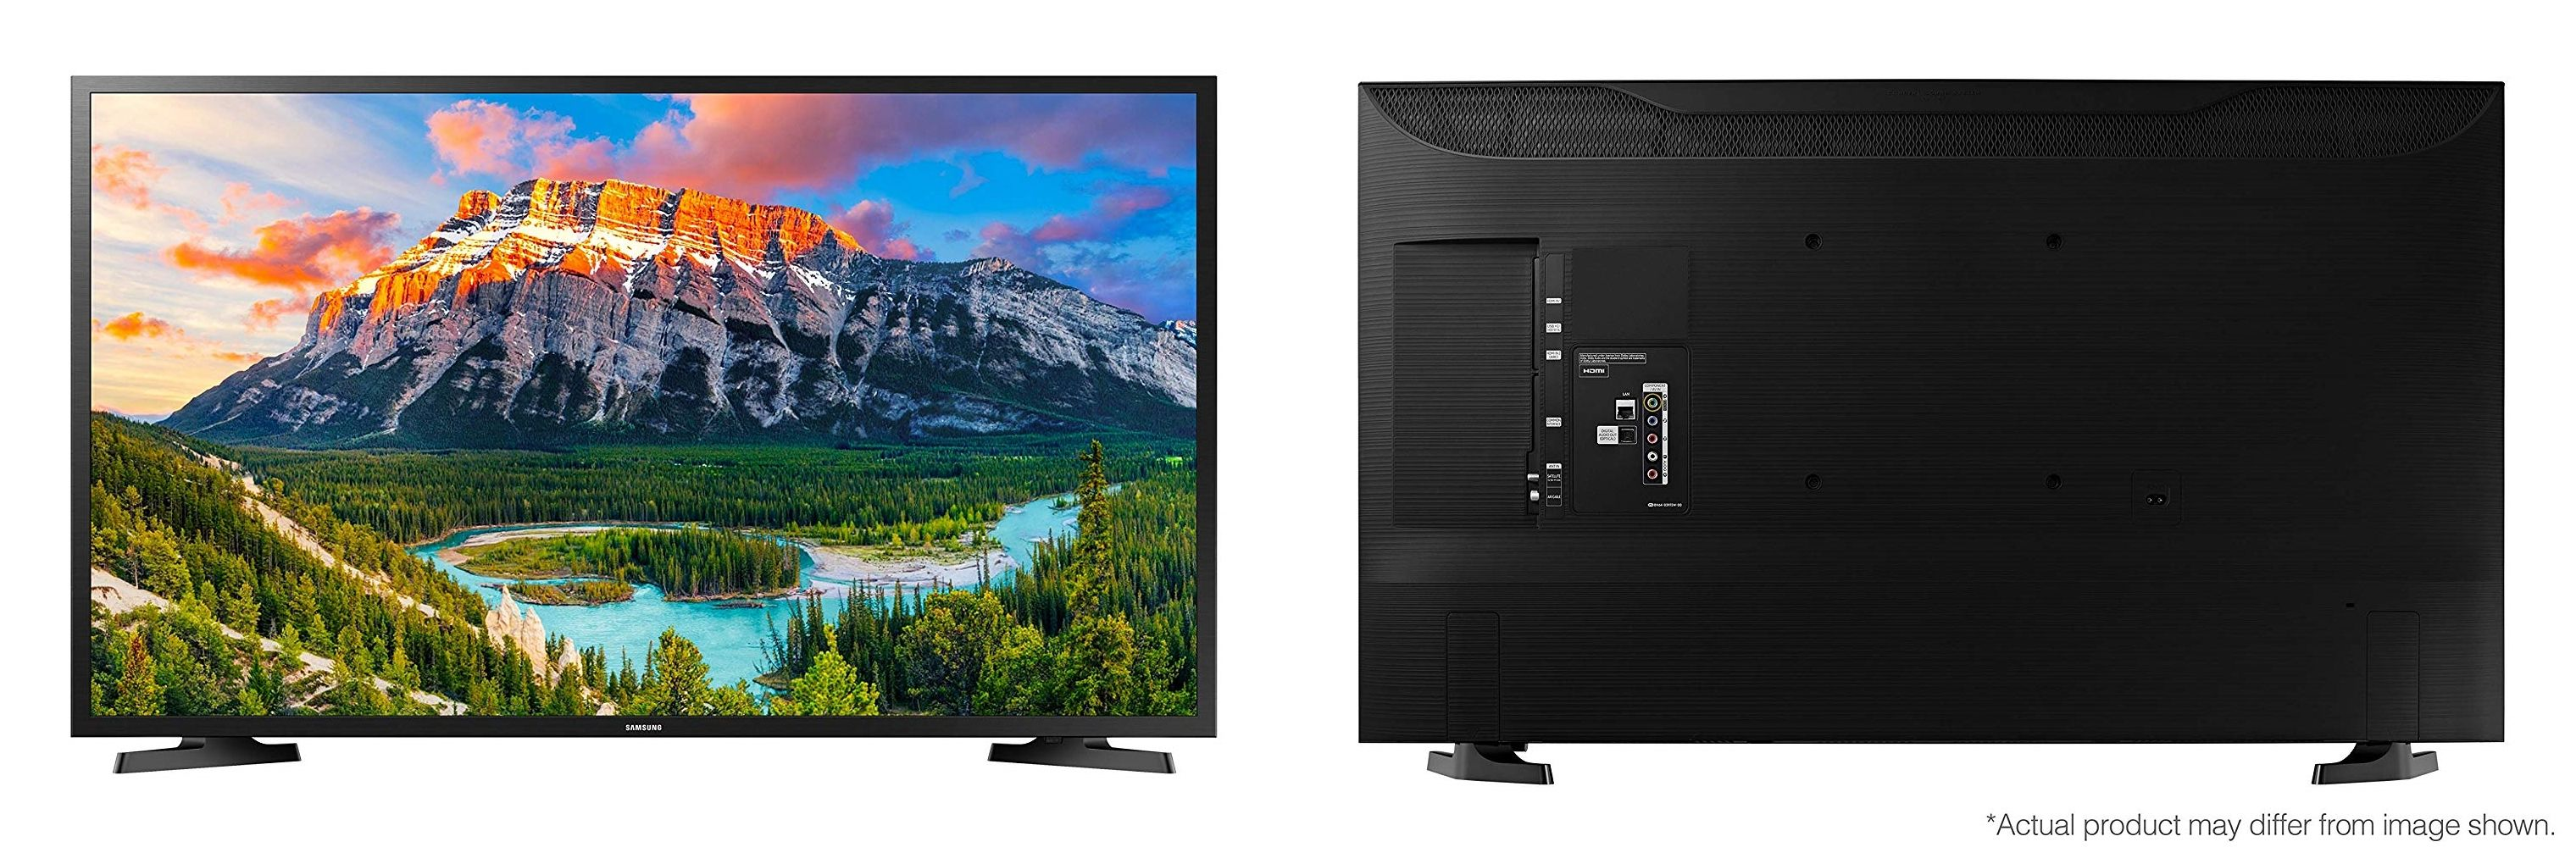 5 Best Smart TV under 25000 Rupees in India 2019 Samsung